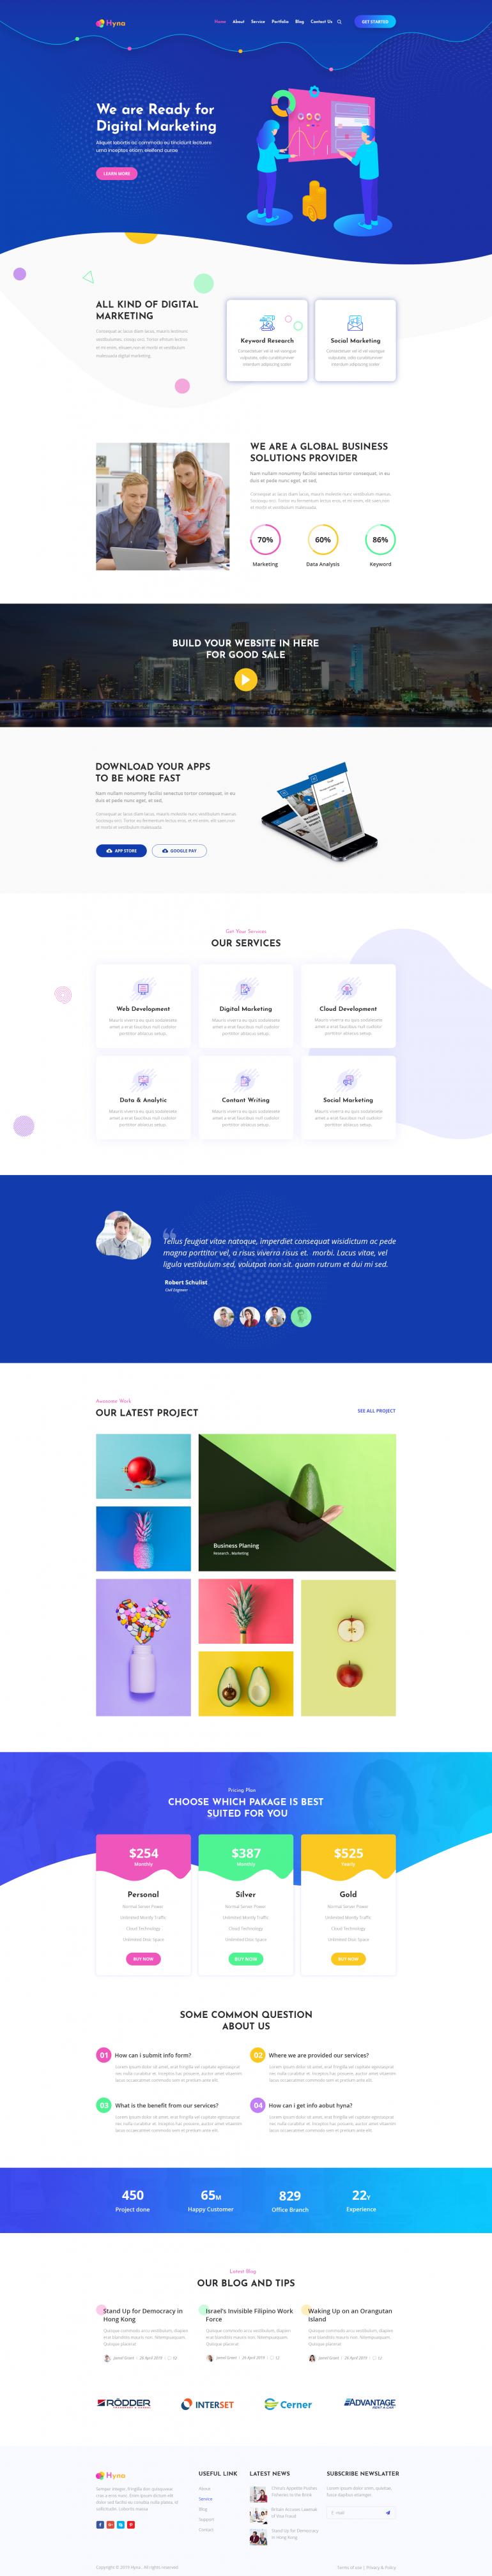 Hyna – Creative Multipurpose PSD Template by rivalinfotech